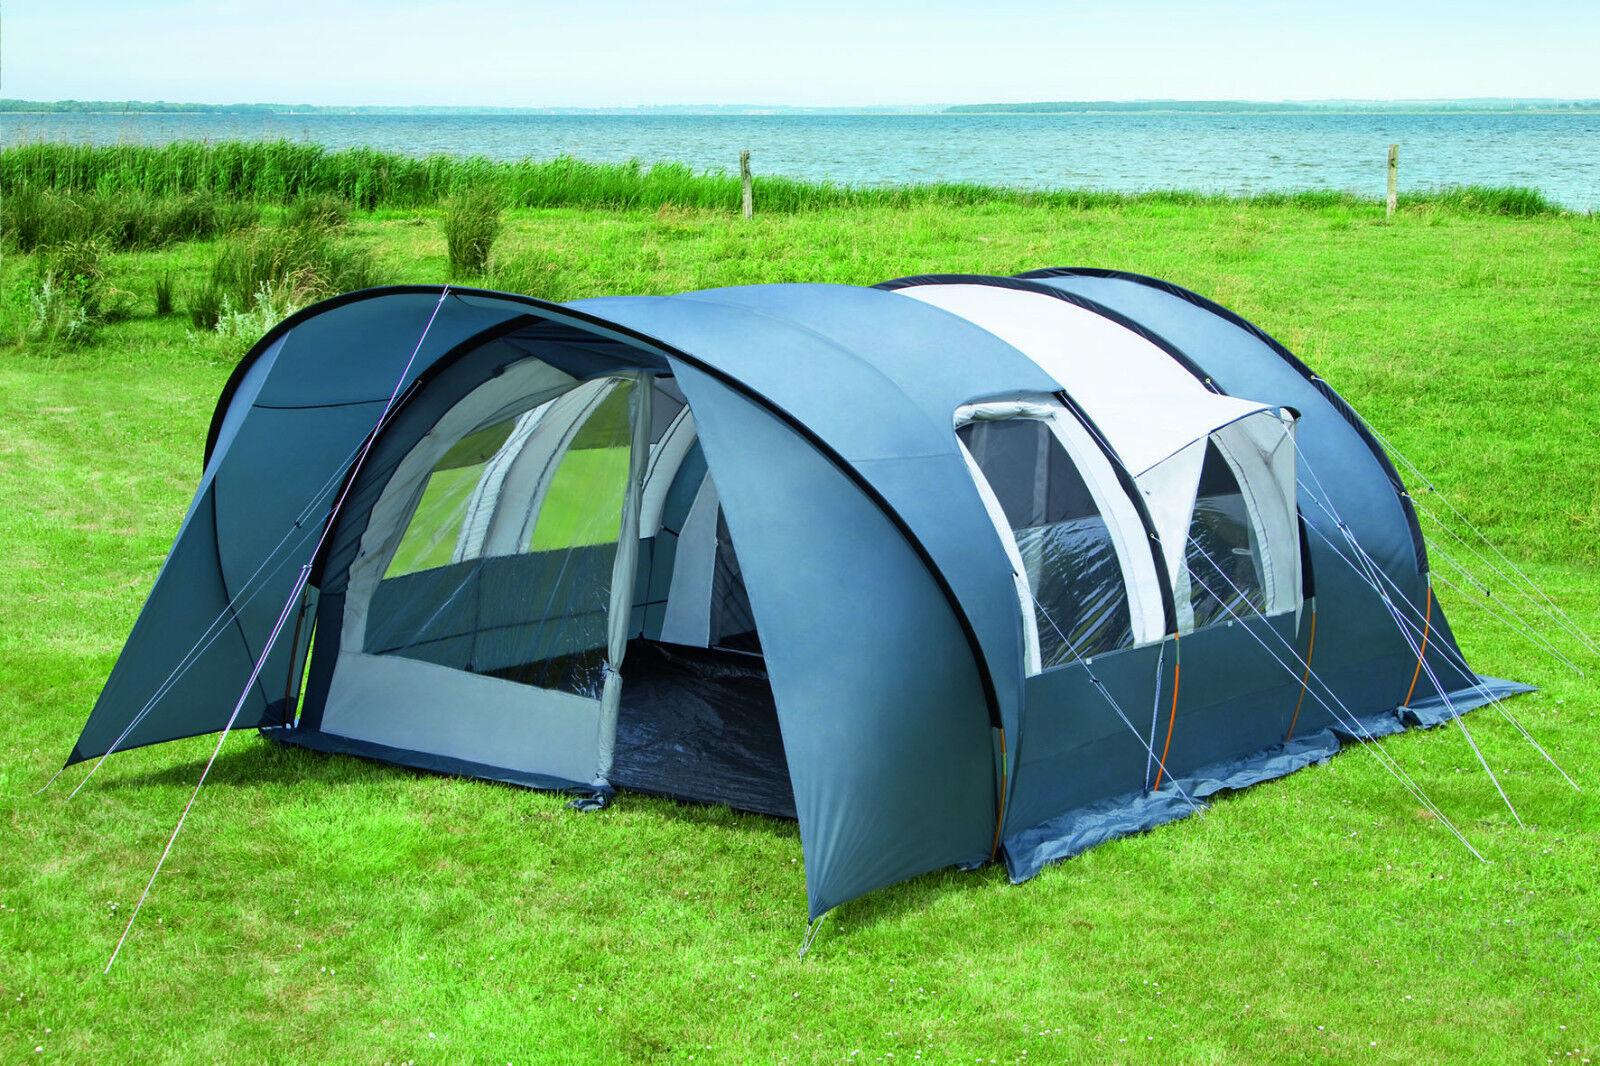 Dwt Zelt Gobi Plus Größe 5 mit abnehmbarem Sonnenvordach Touringzelt Tunnelzelt